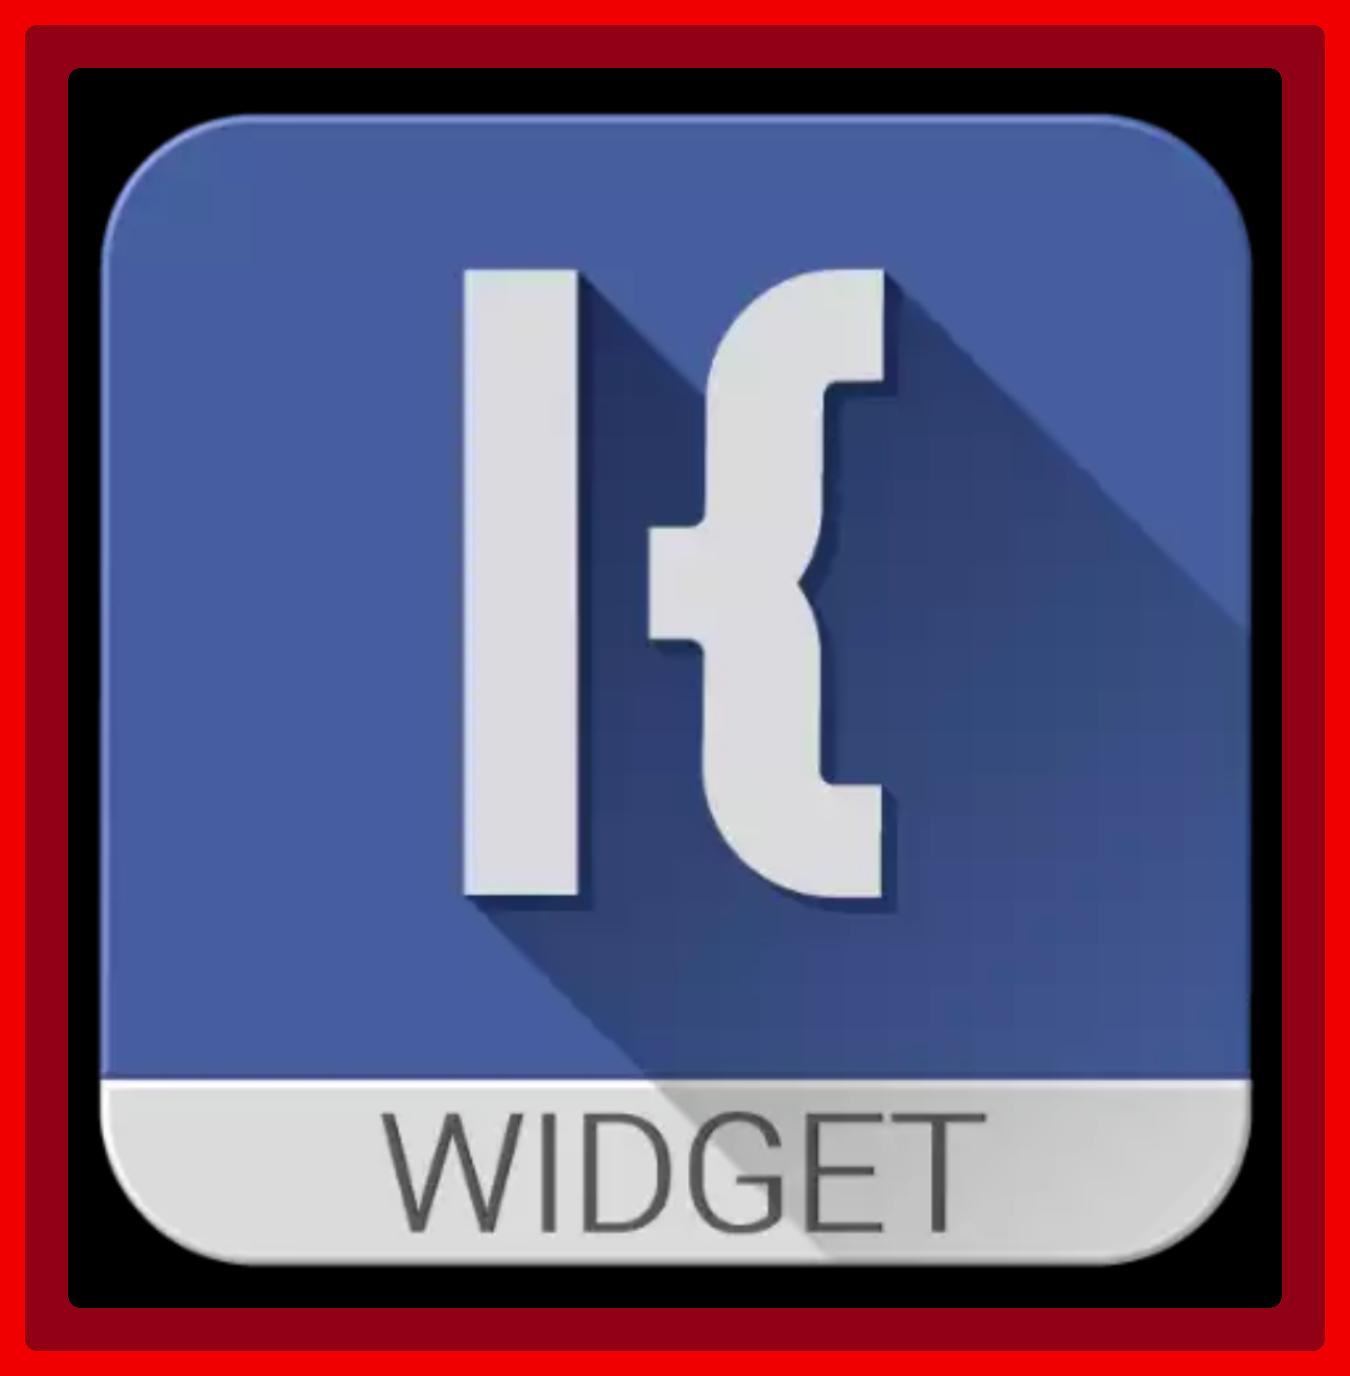 [Android] KWGT Kustom Widget Pro Key GRATIS statt 3,99€